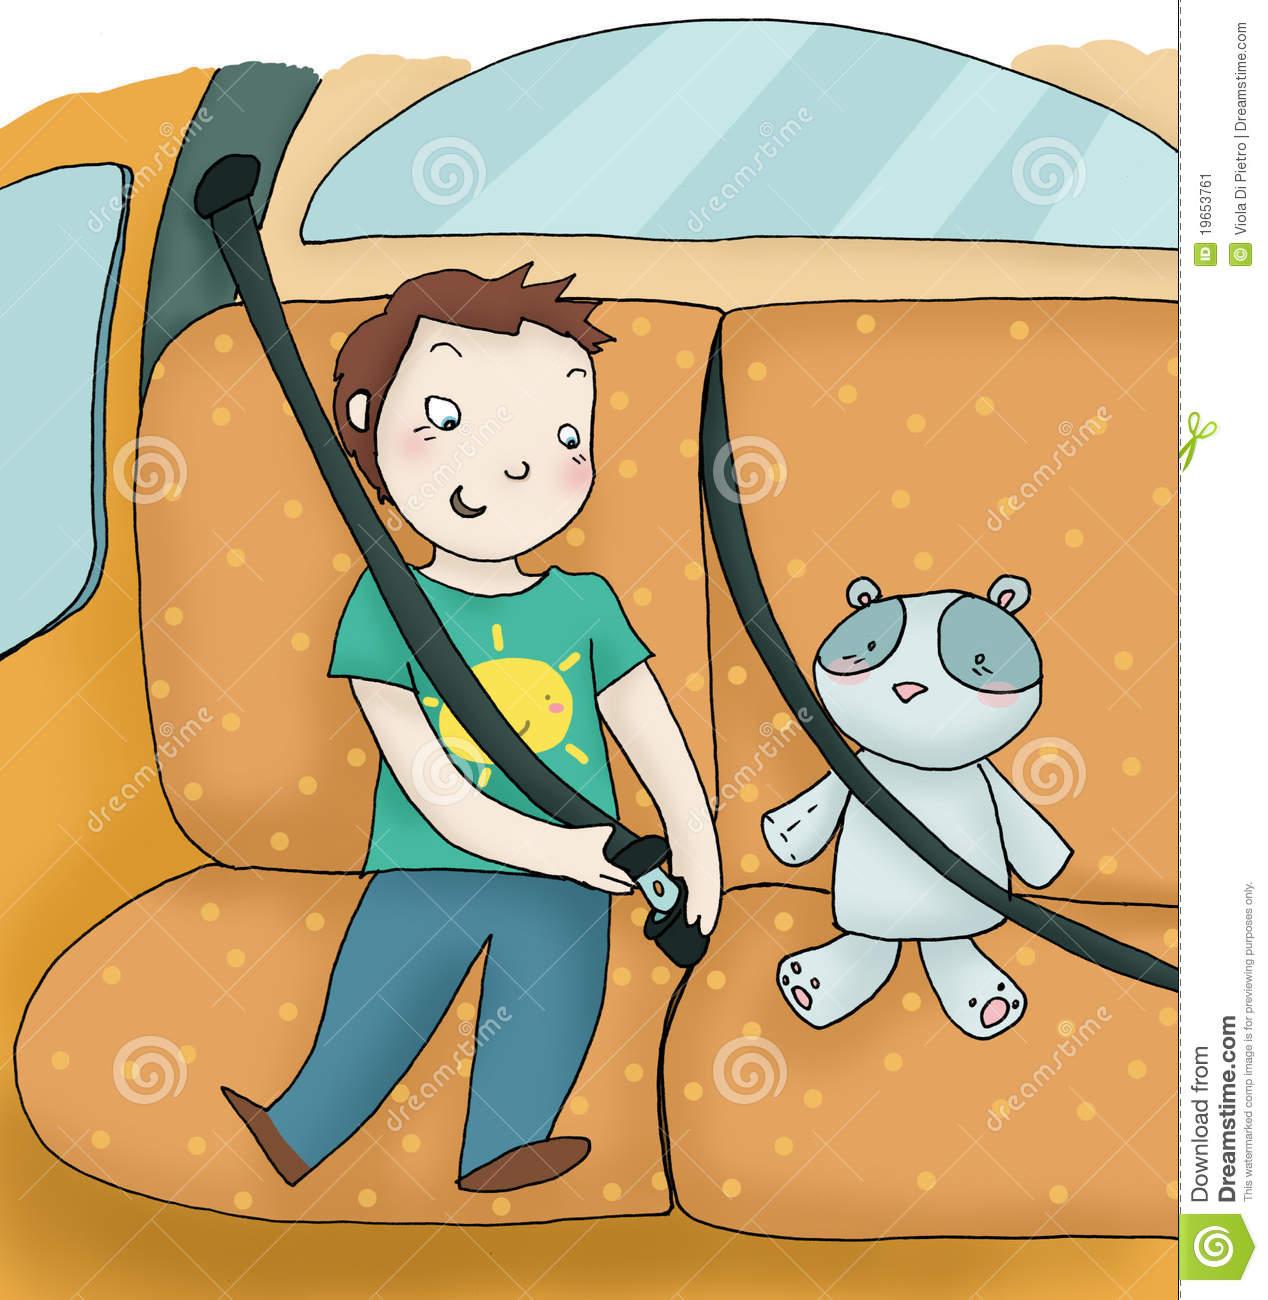 Child And Seat Belt Stock Image.